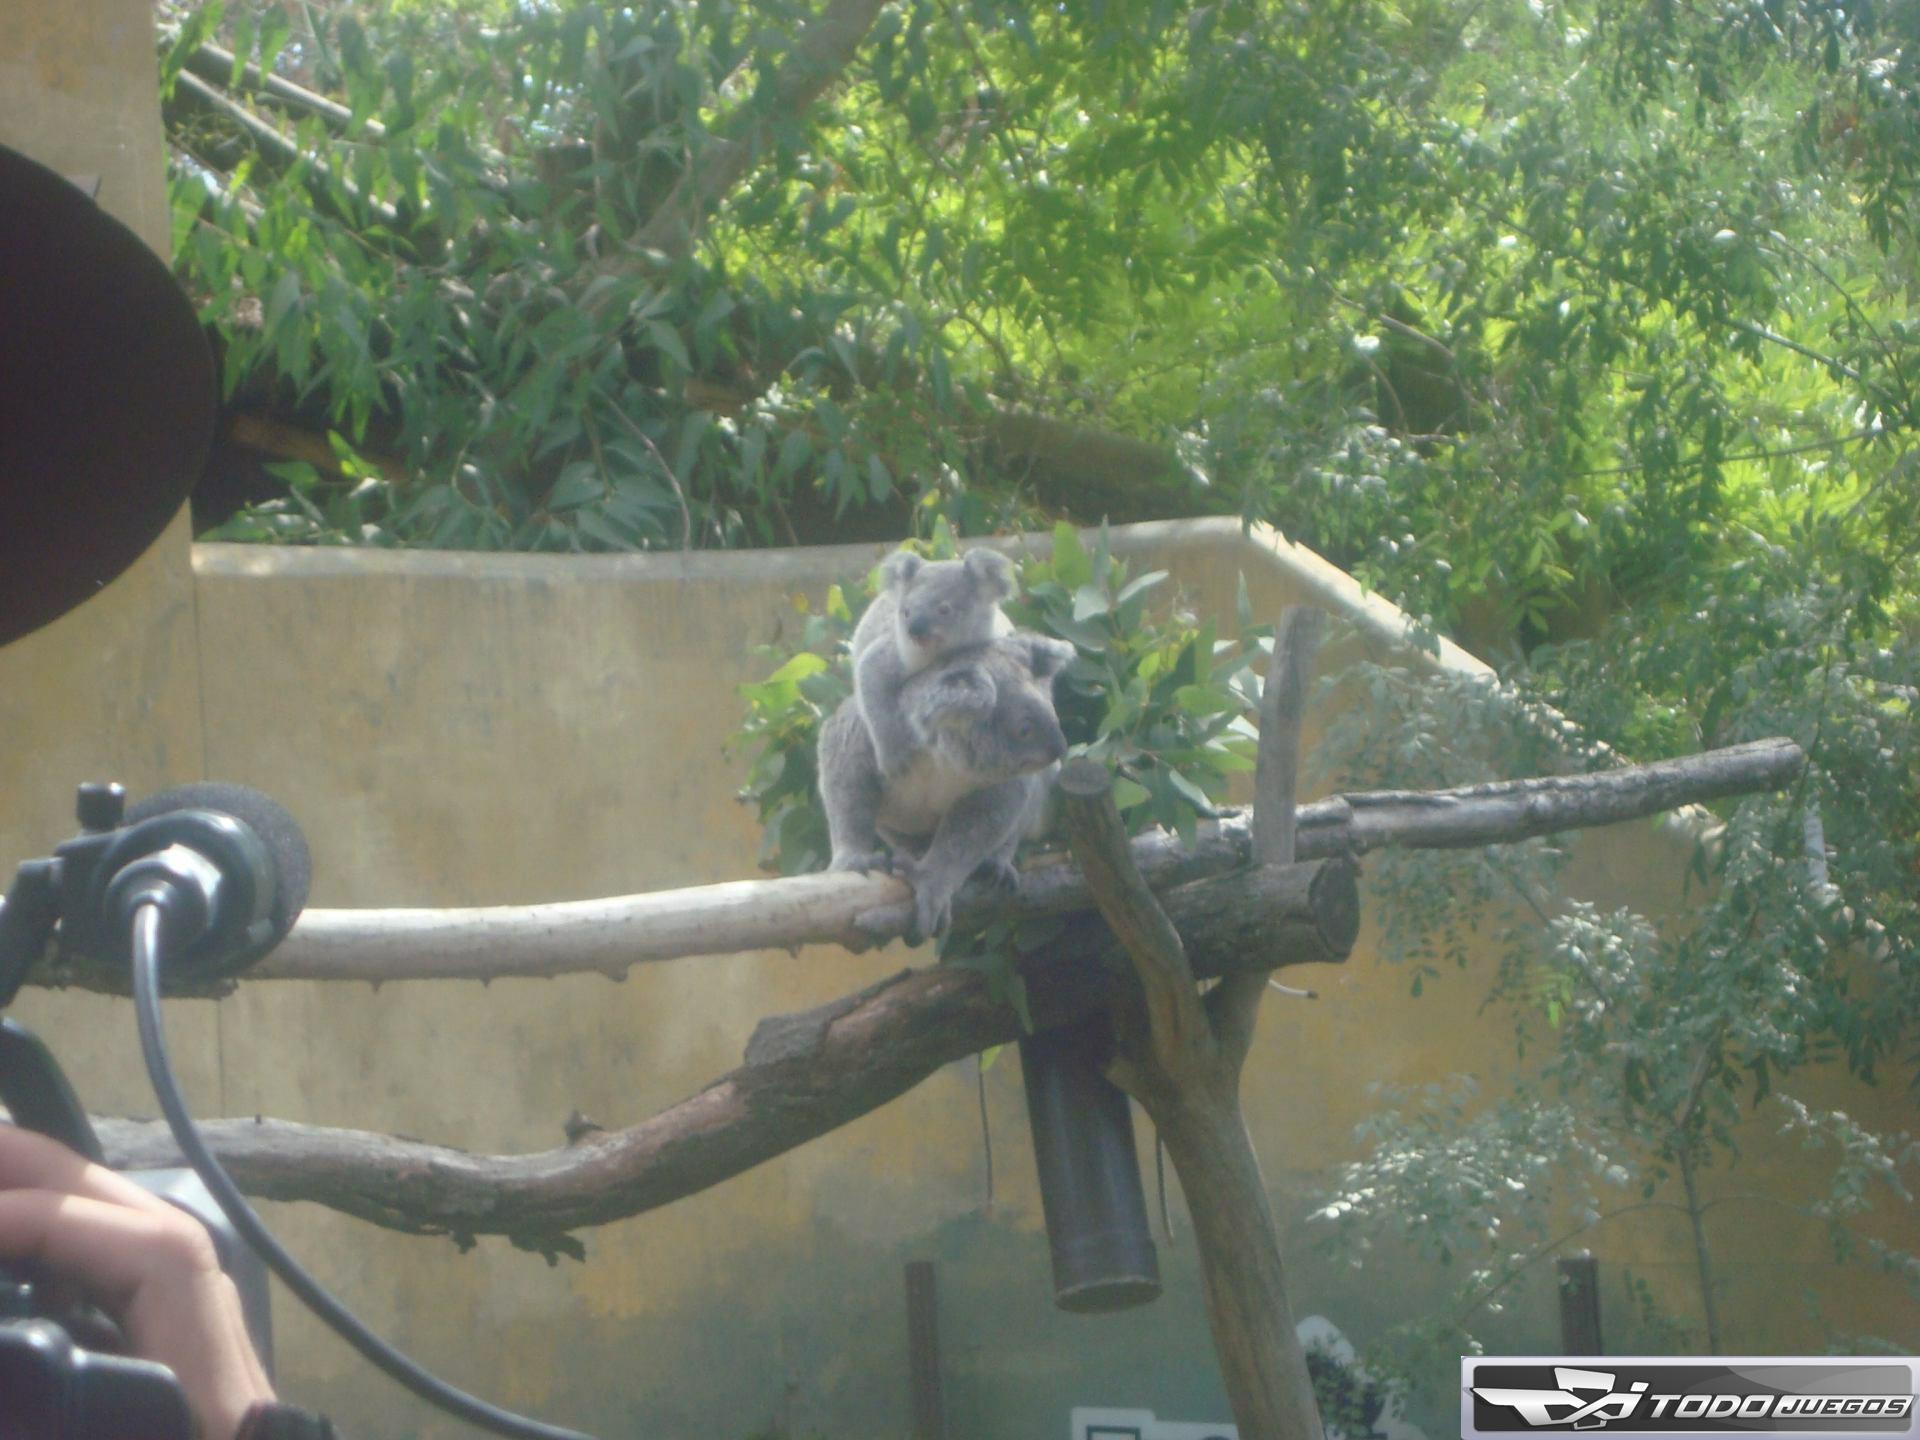 Cría de koala se llama como un juego de Play Station